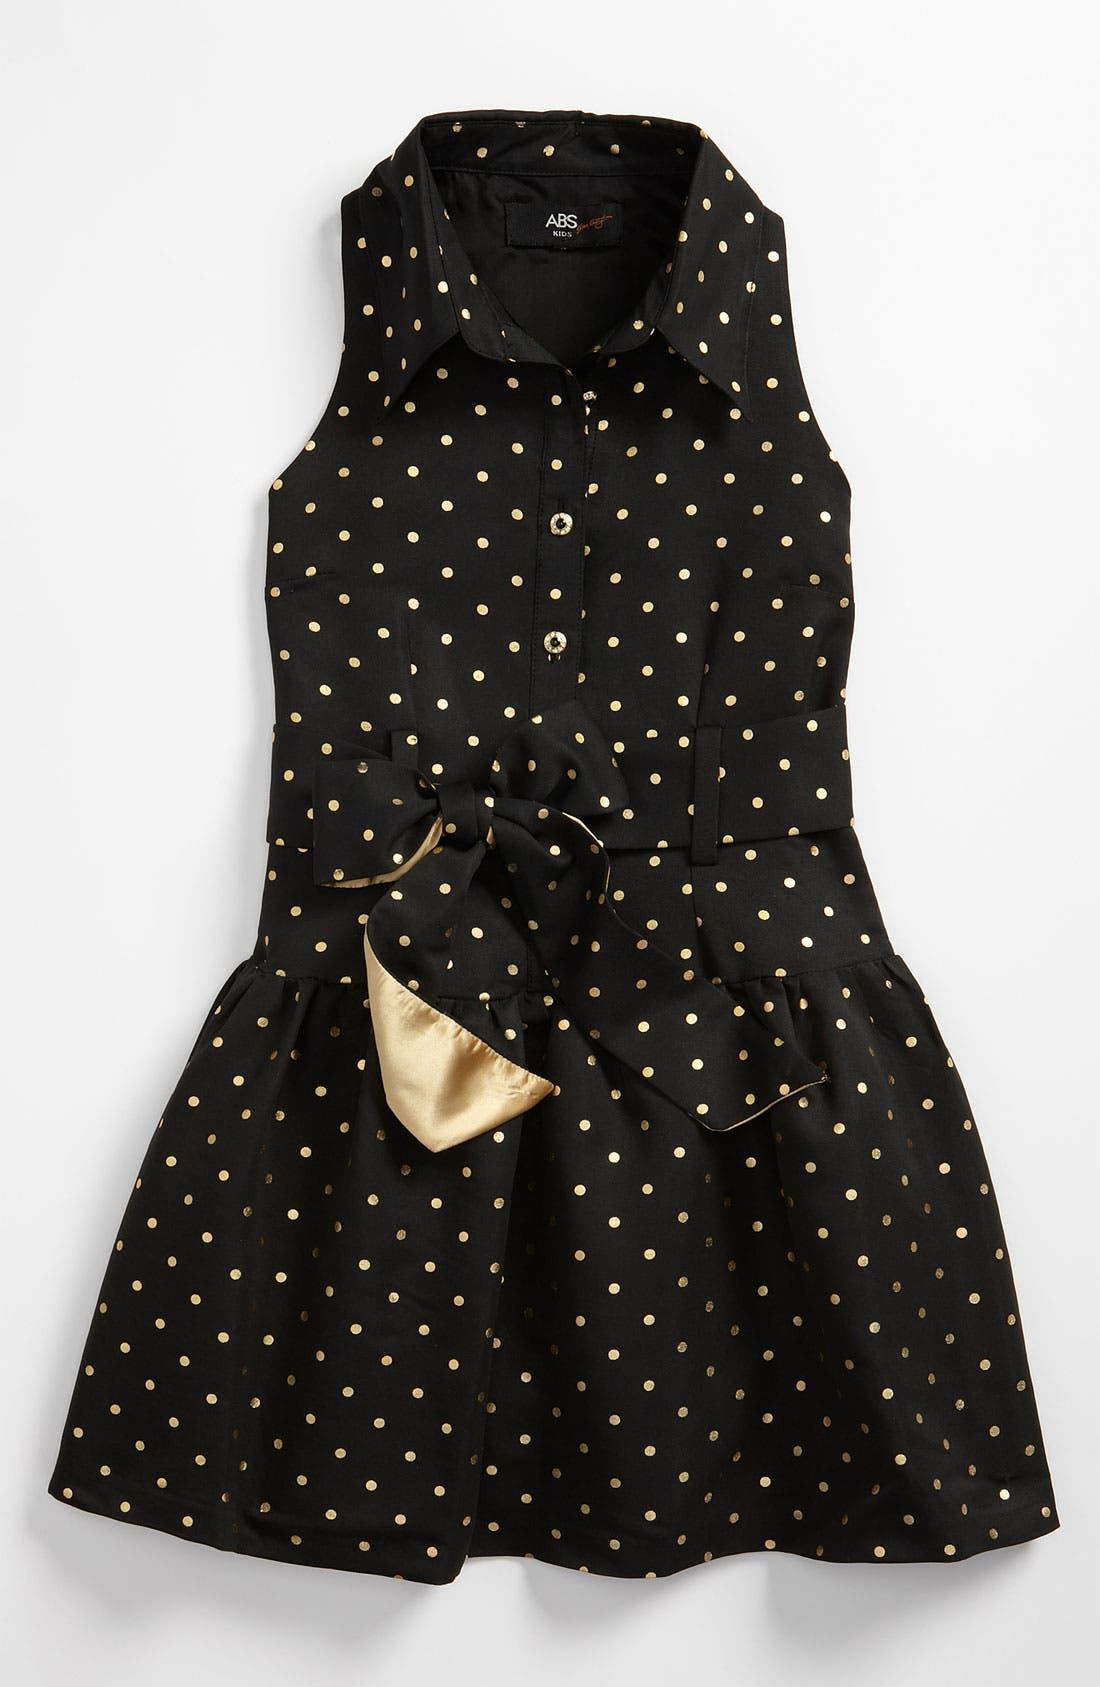 Main Image - ABS by Allen Schwartz Polka Dot Shirtdress (Big Girls)